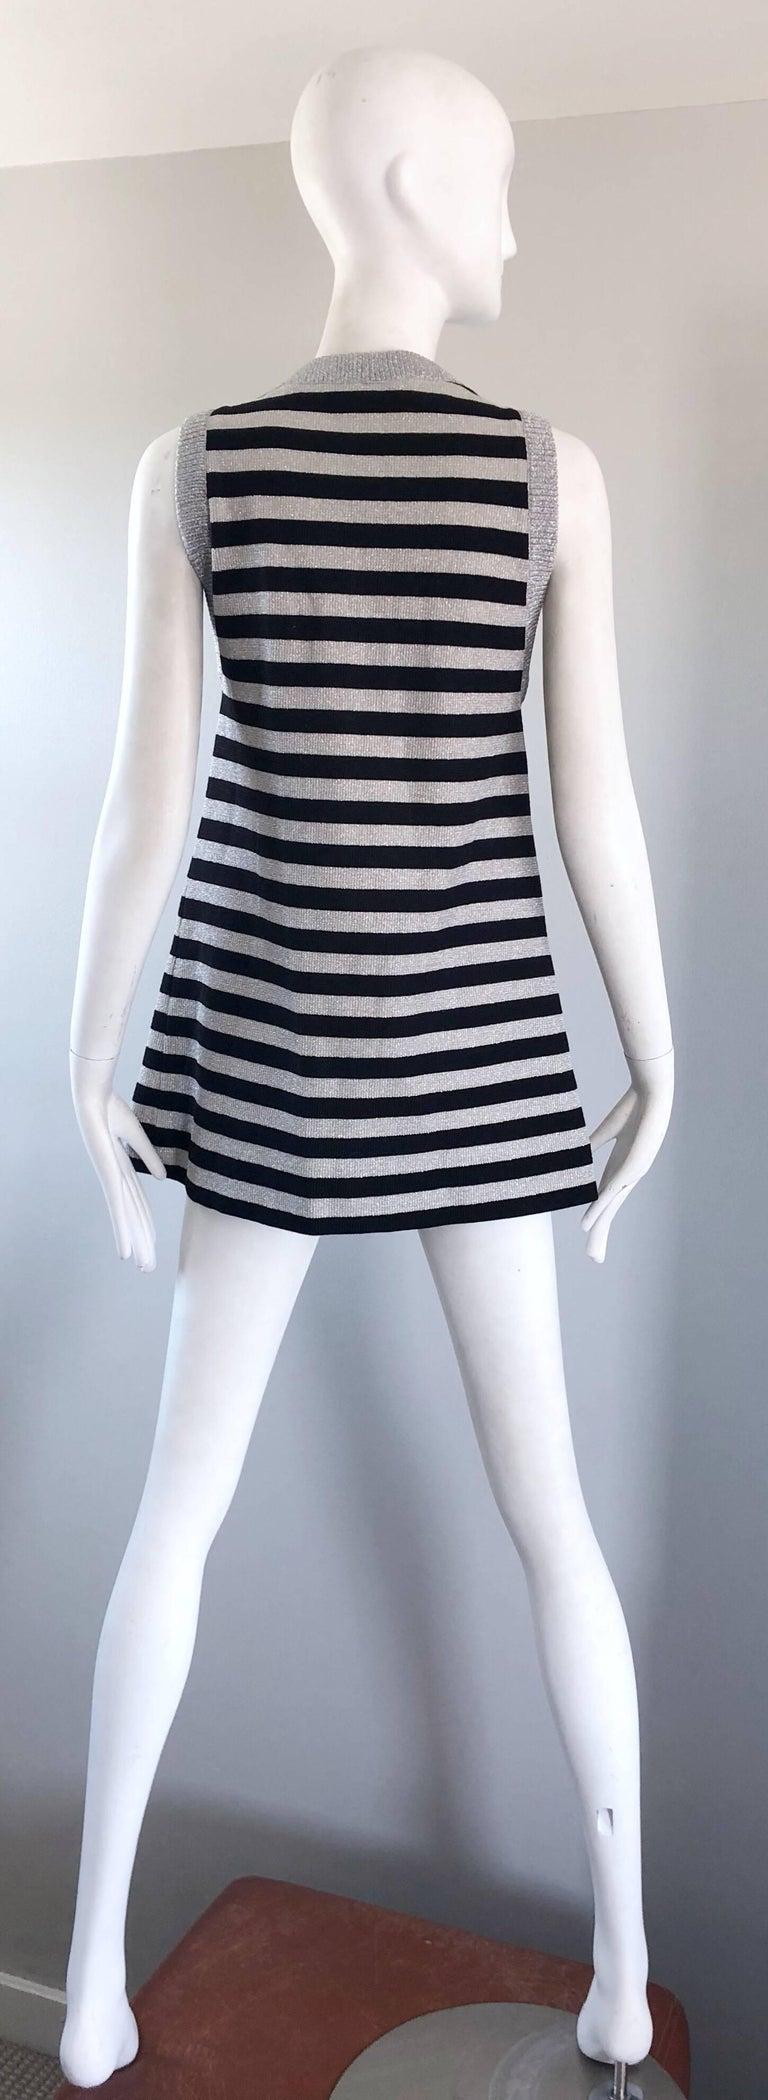 Women's 1970s Silver + Black Metallic Striped Sleeveless Vintage Vest Tunic / Mini Dress For Sale